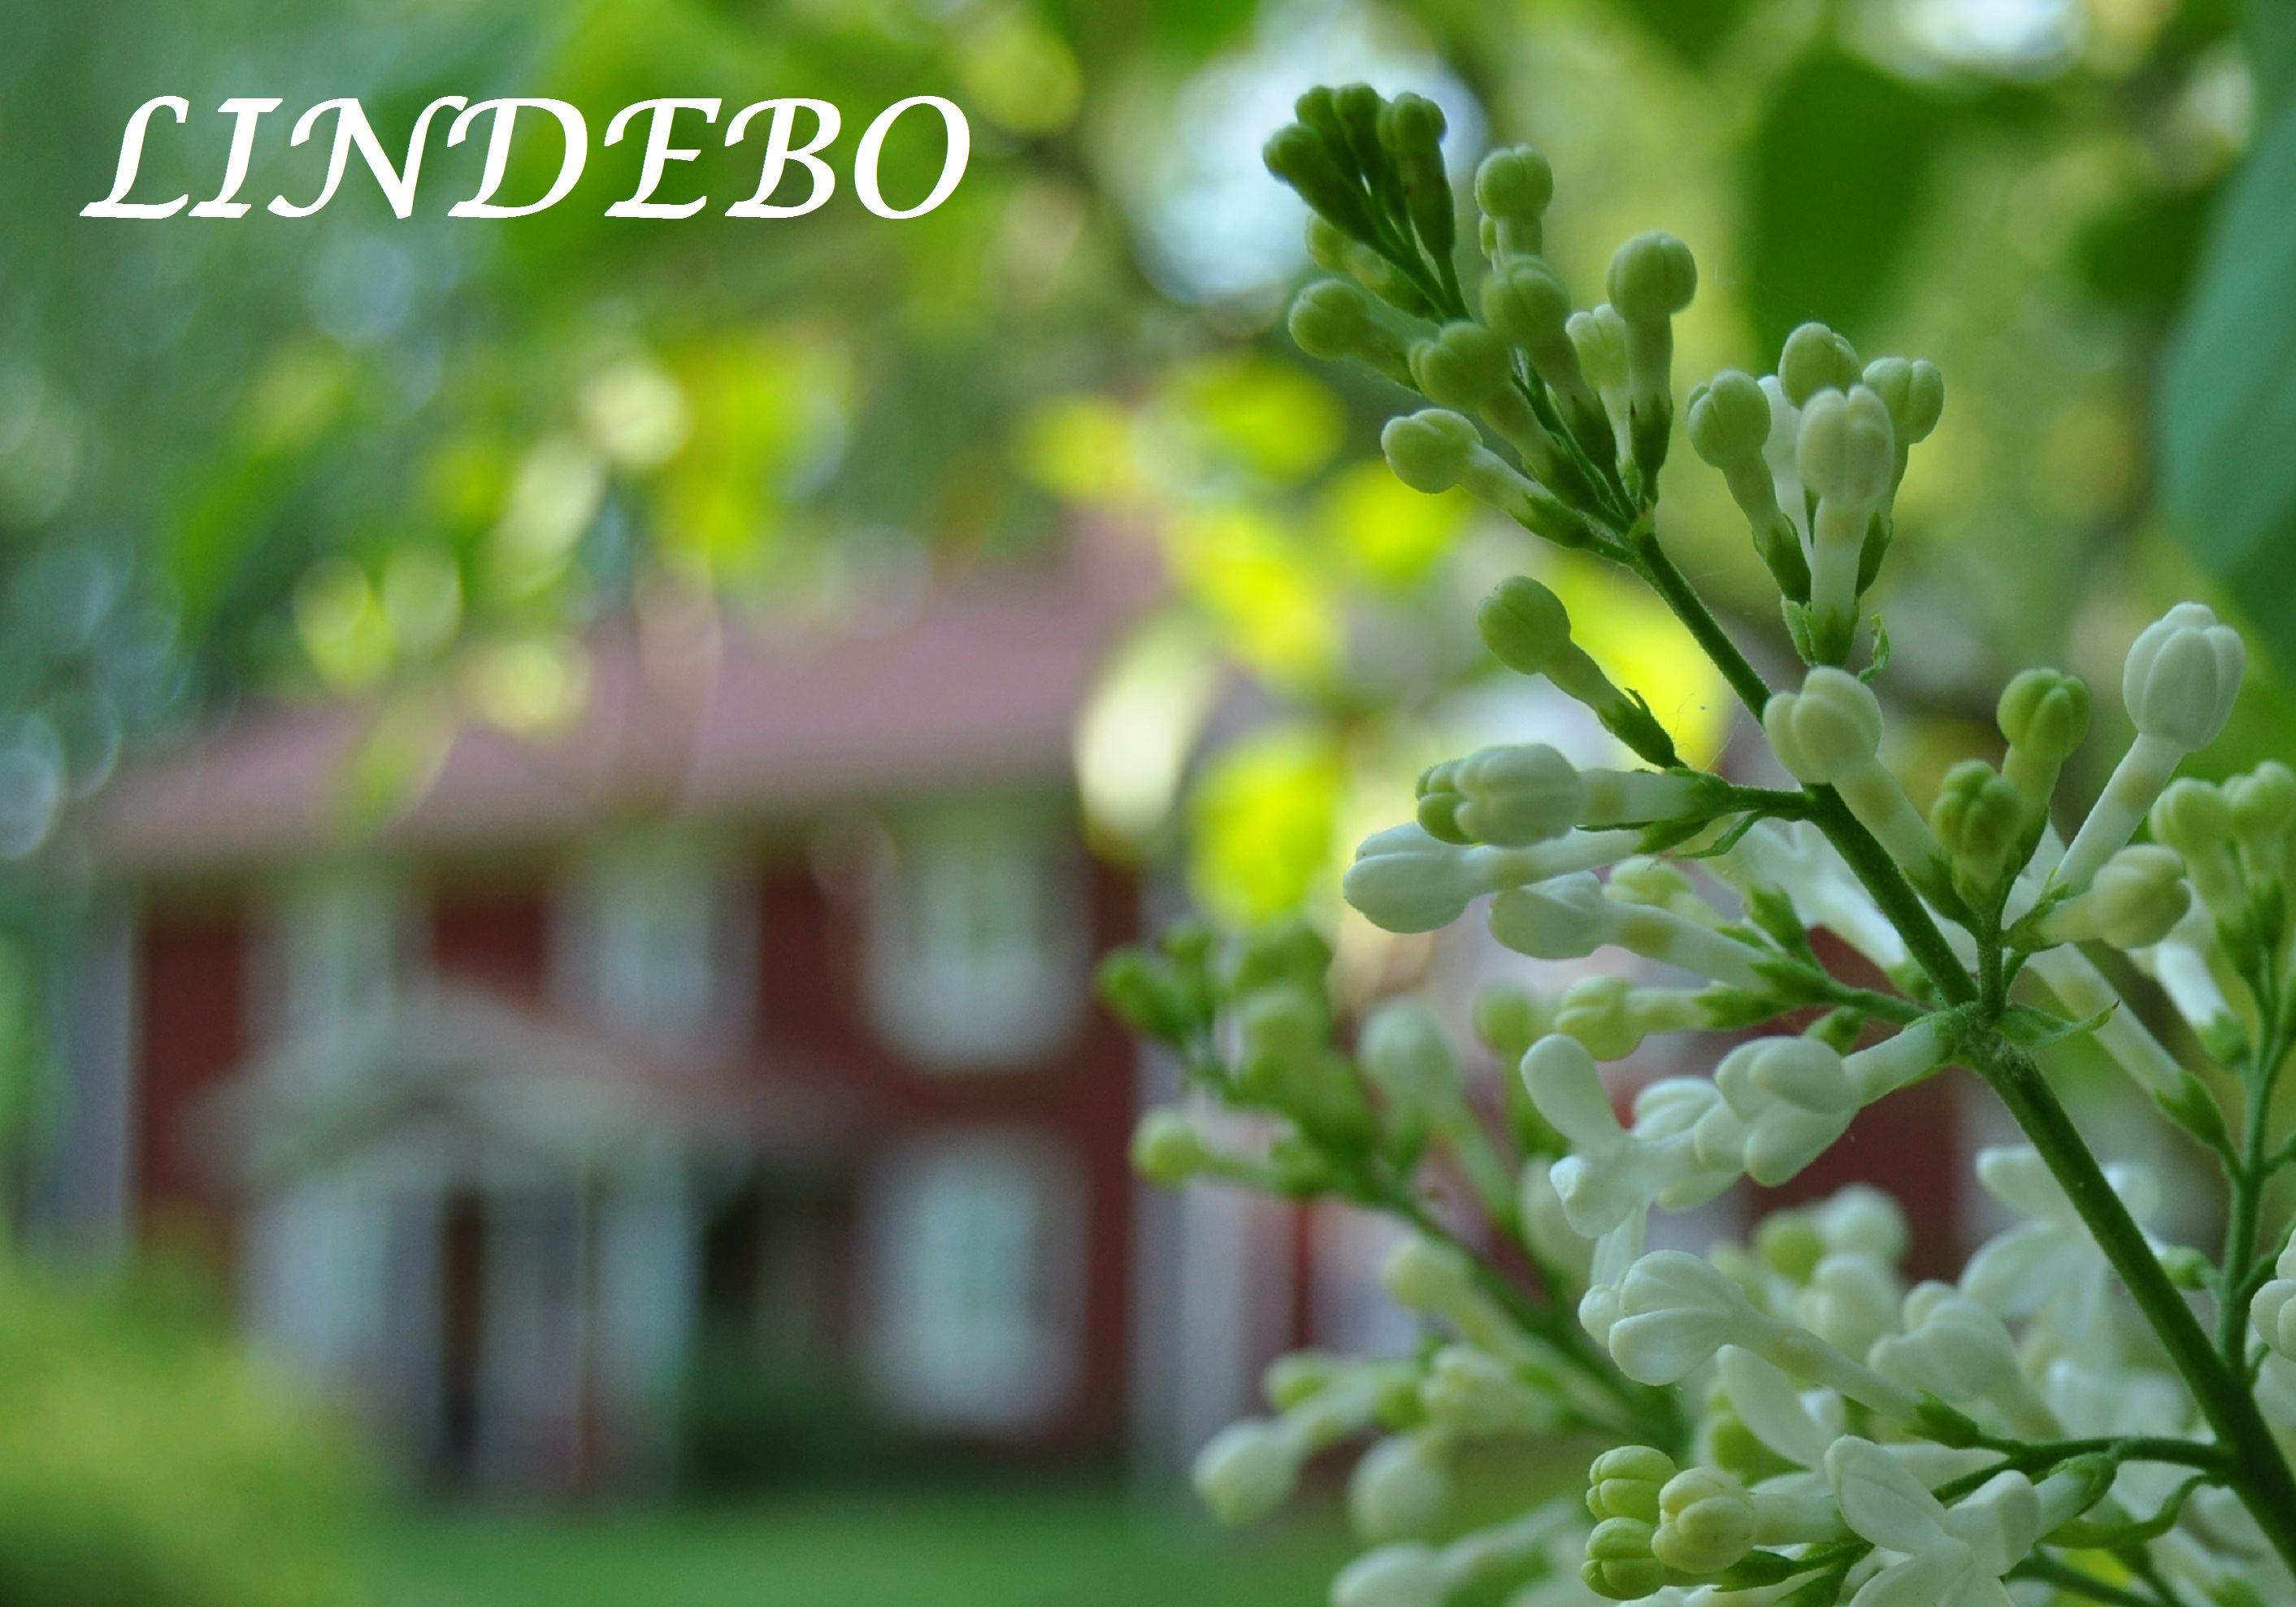 Lindebo Holiday home agency